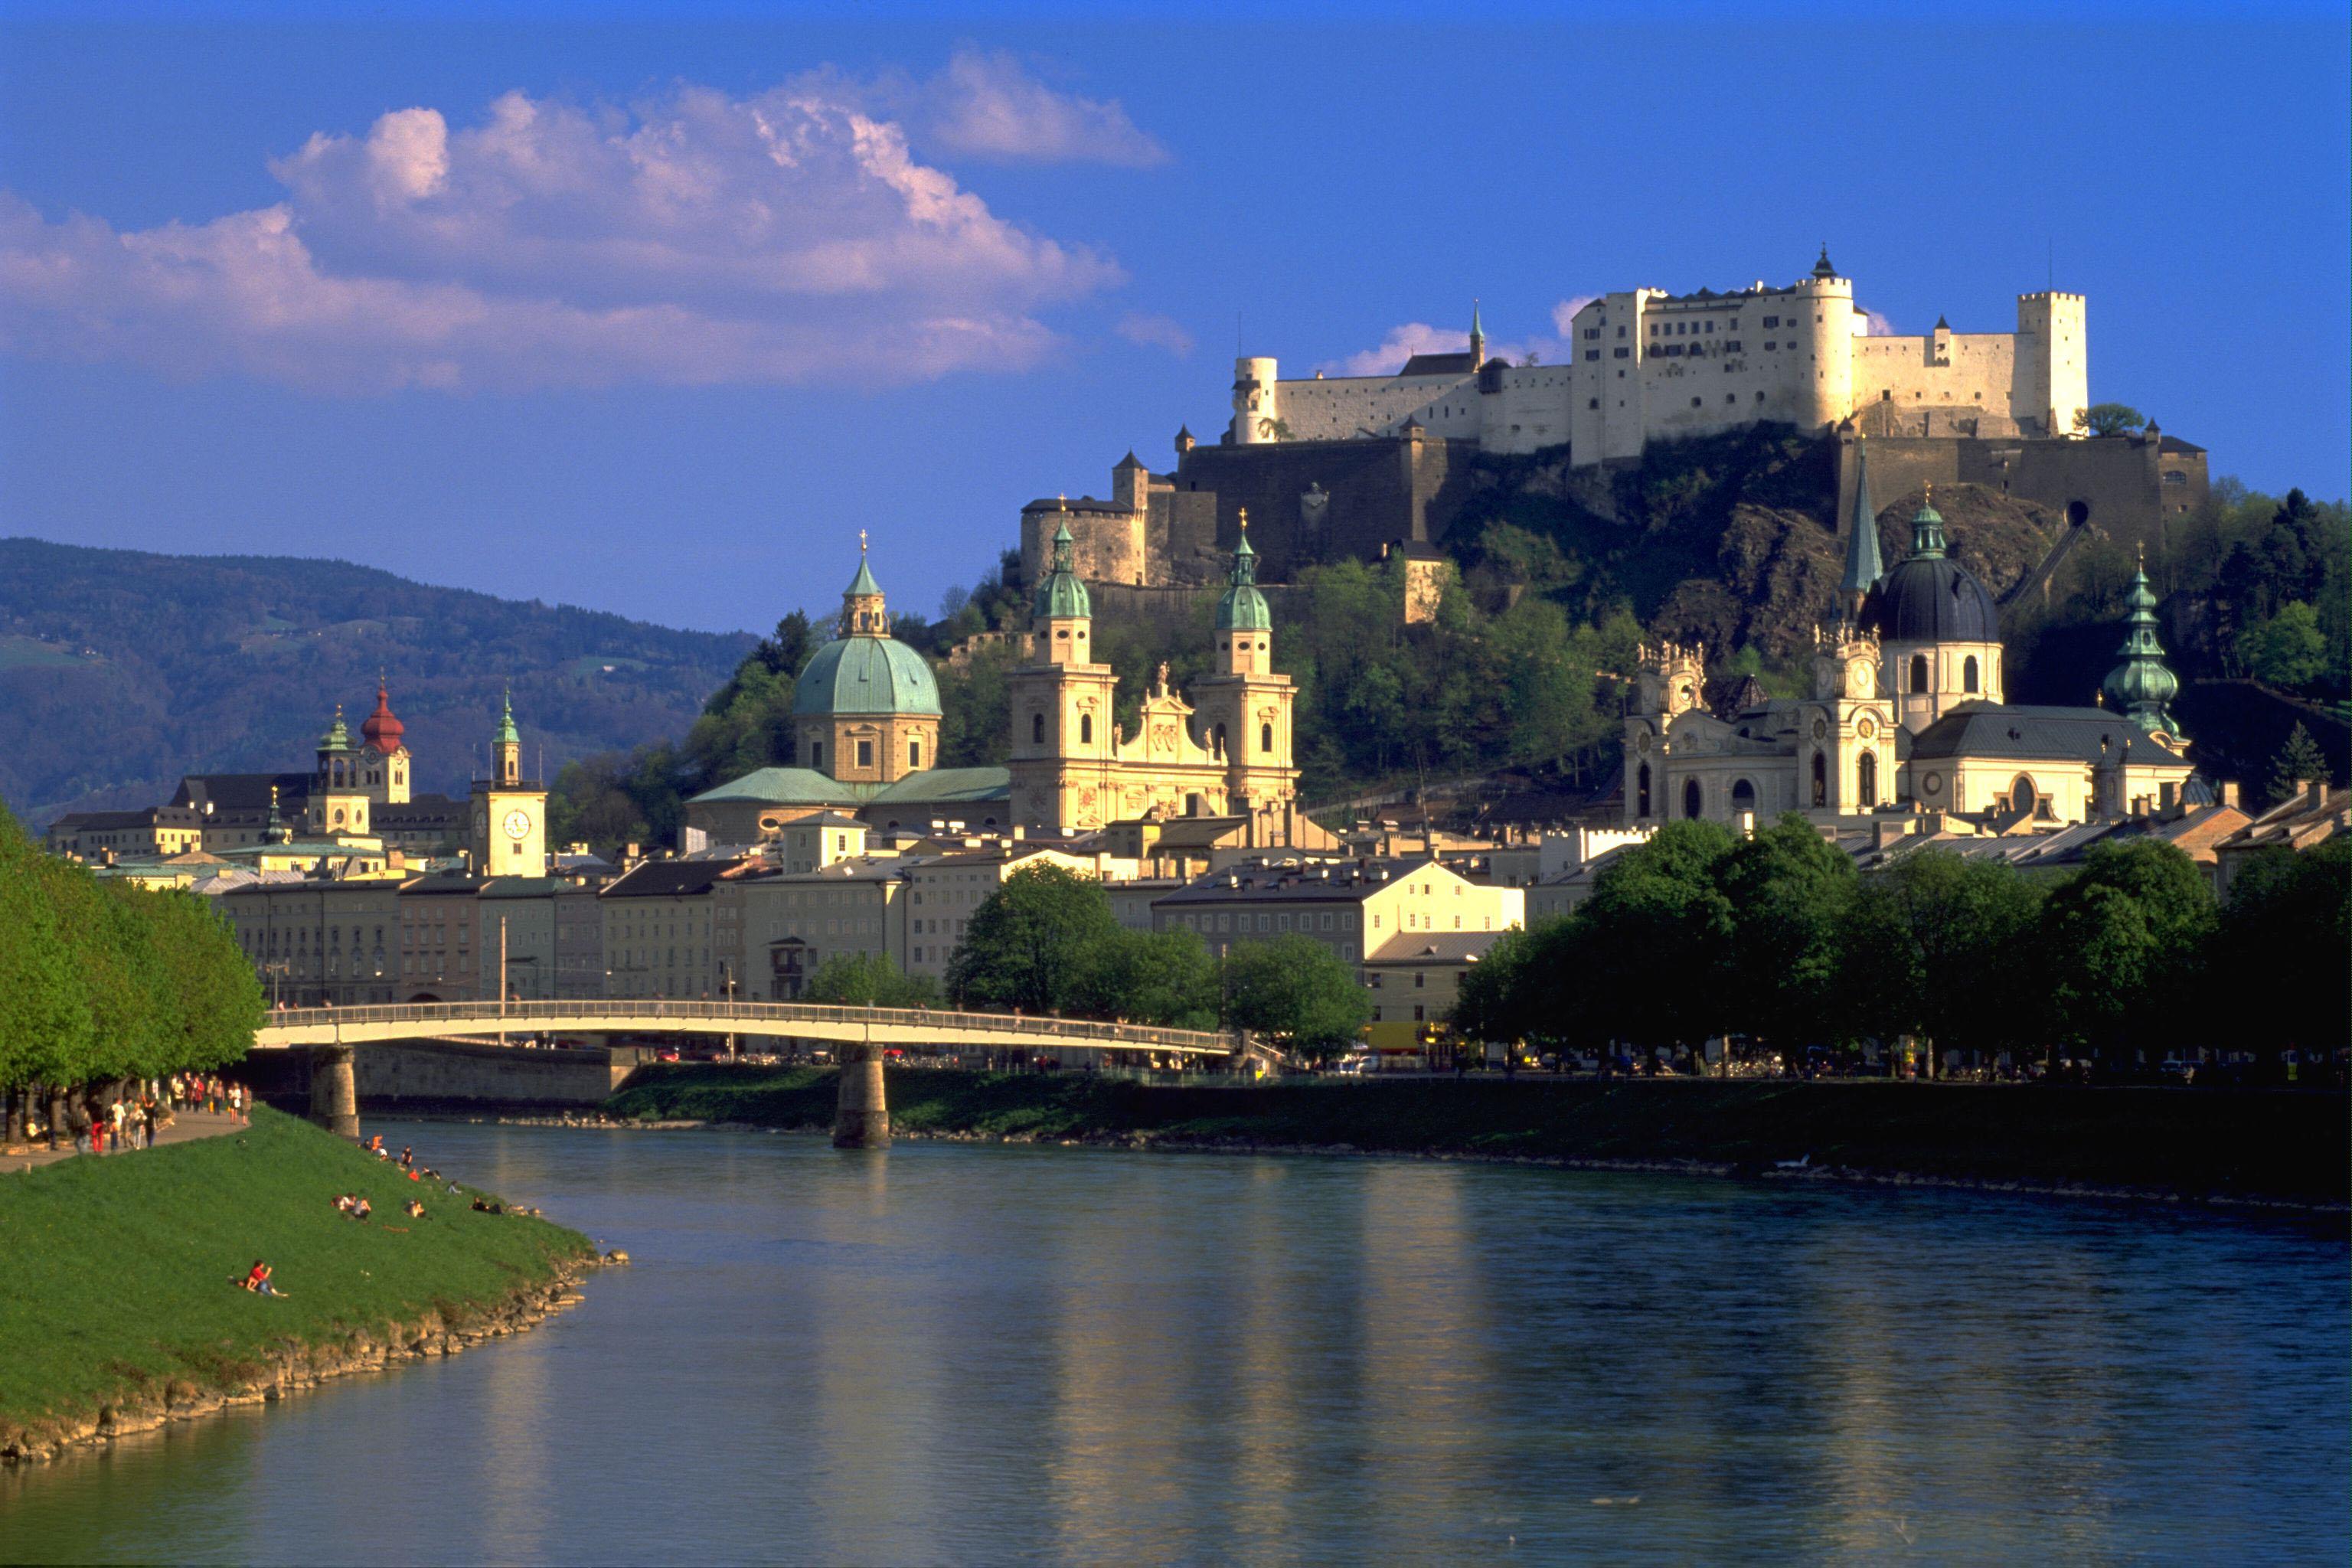 Arbeitspsychologie Salzburg salzburg.jpg